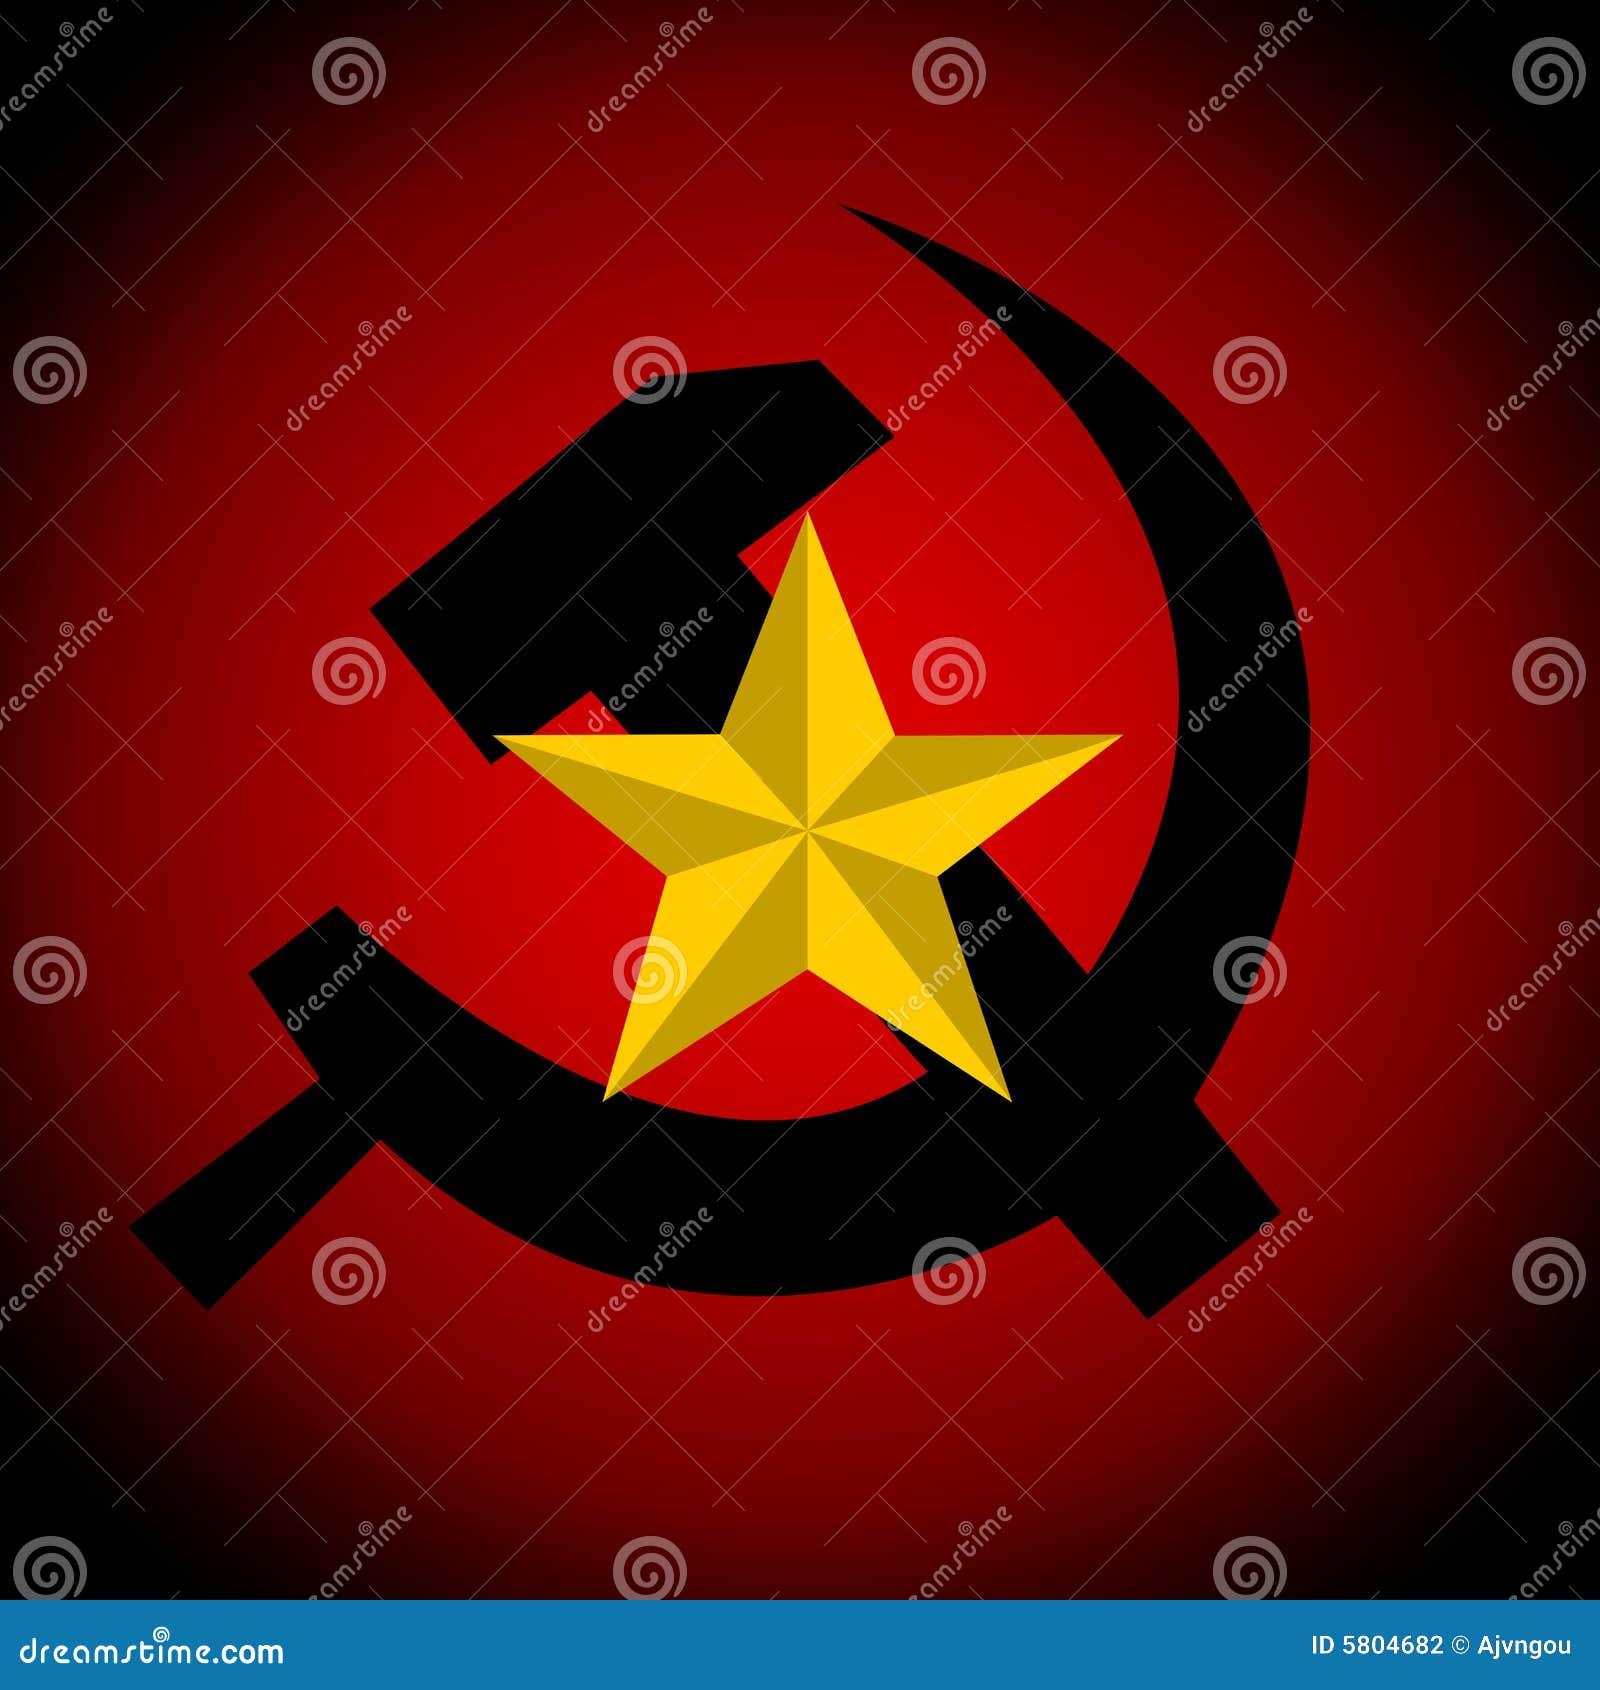 Communist Symbol Star Communism symbol Stock